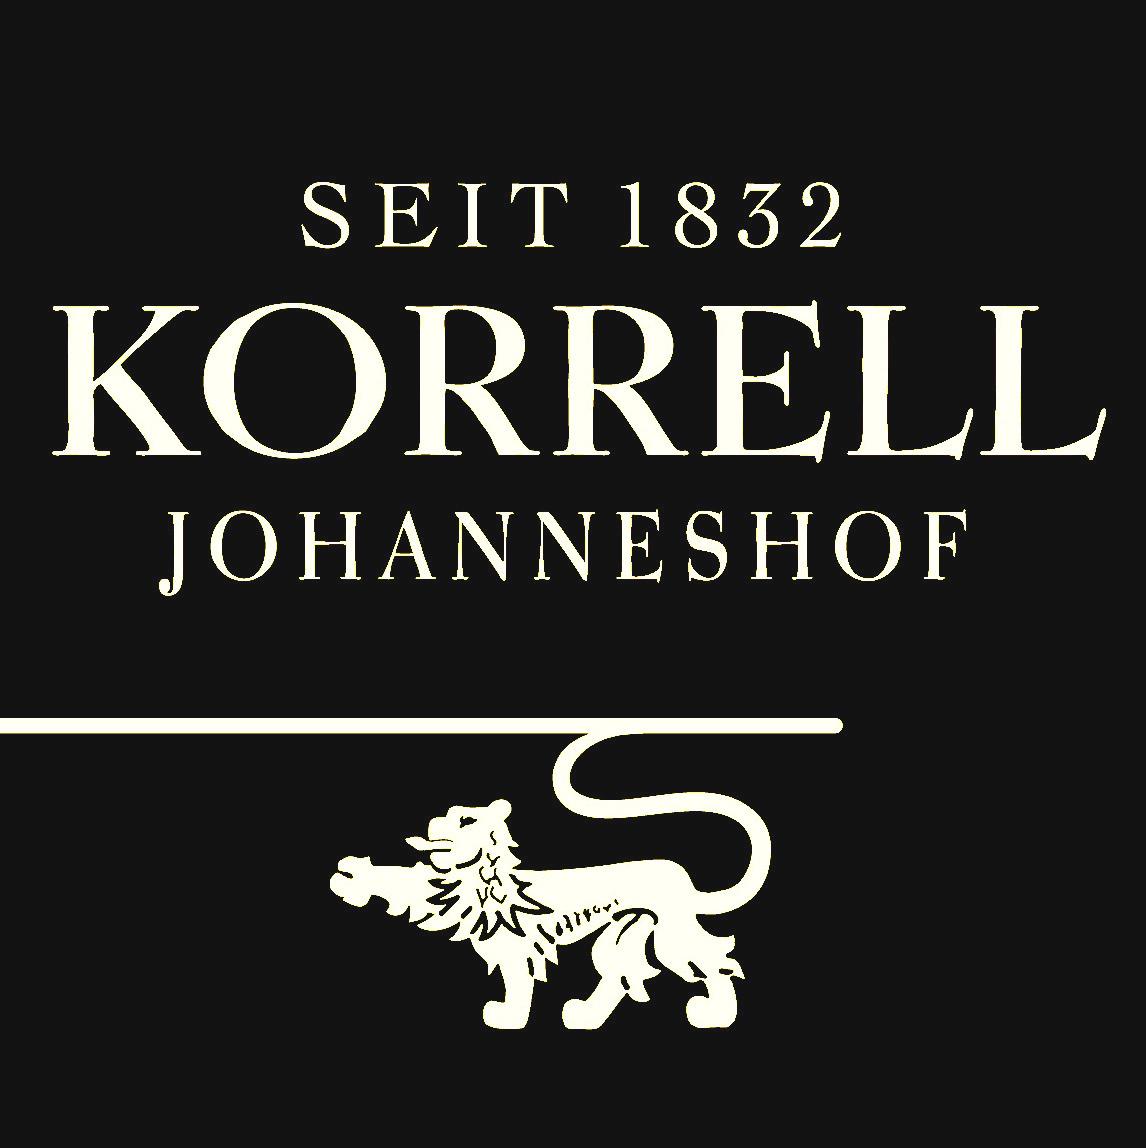 Wappen des Bosenheimer Weingutes Korrell Johanneshof